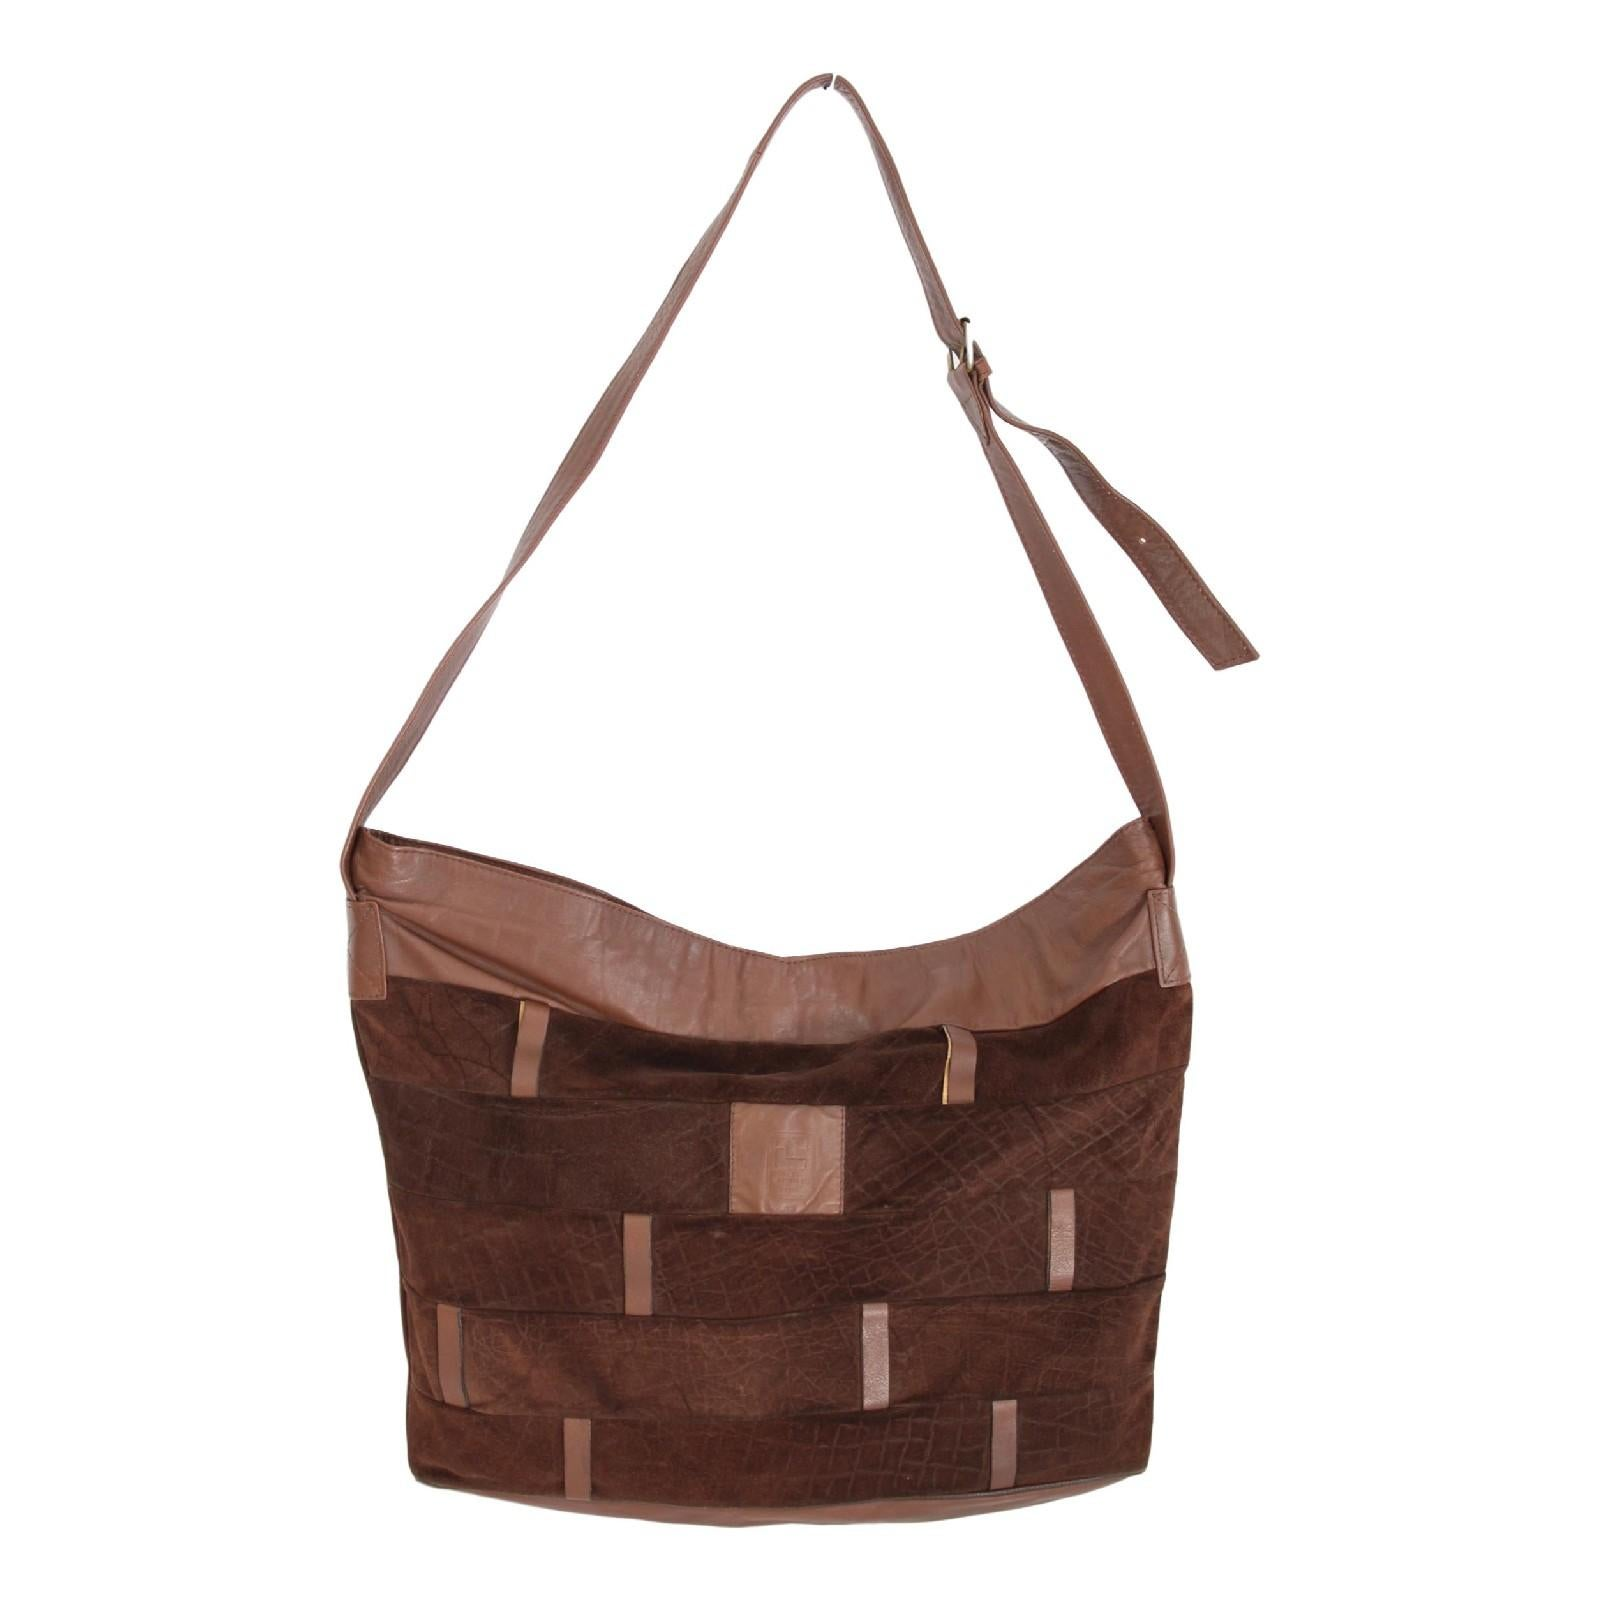 fff3c3861b1 Ted Lapidus Signature Logo embossed handbag For Sale at 1stdibs